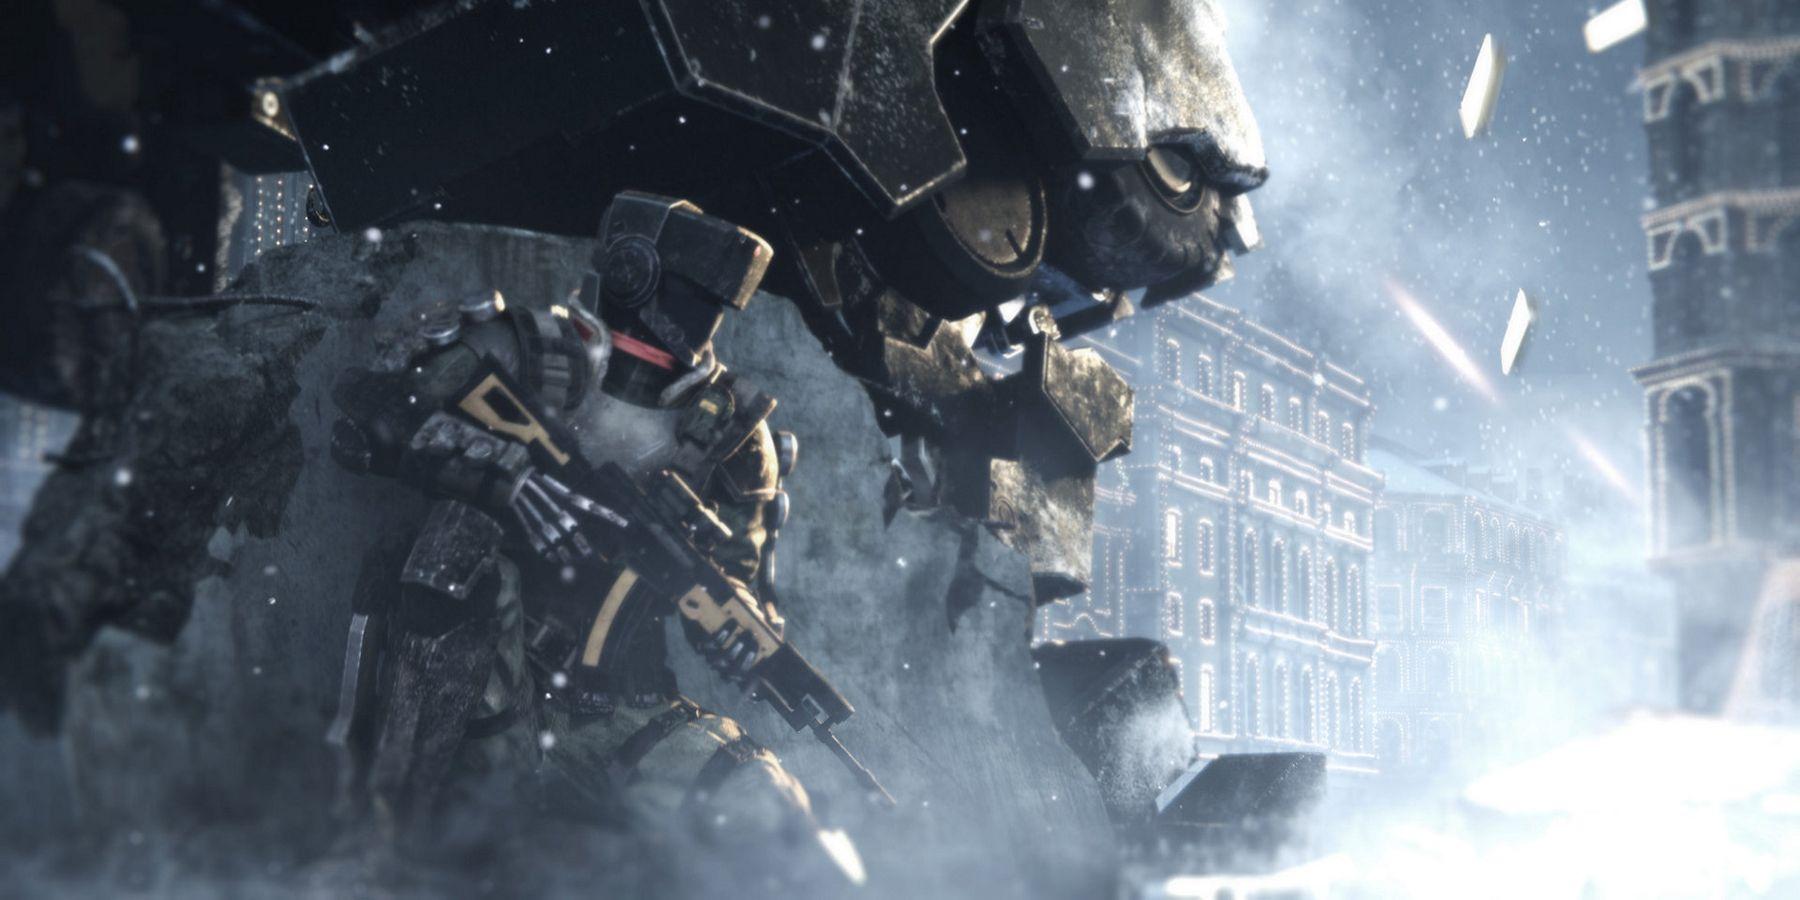 Left Alive Trailer: Square Enix Shows A War-Torn Future